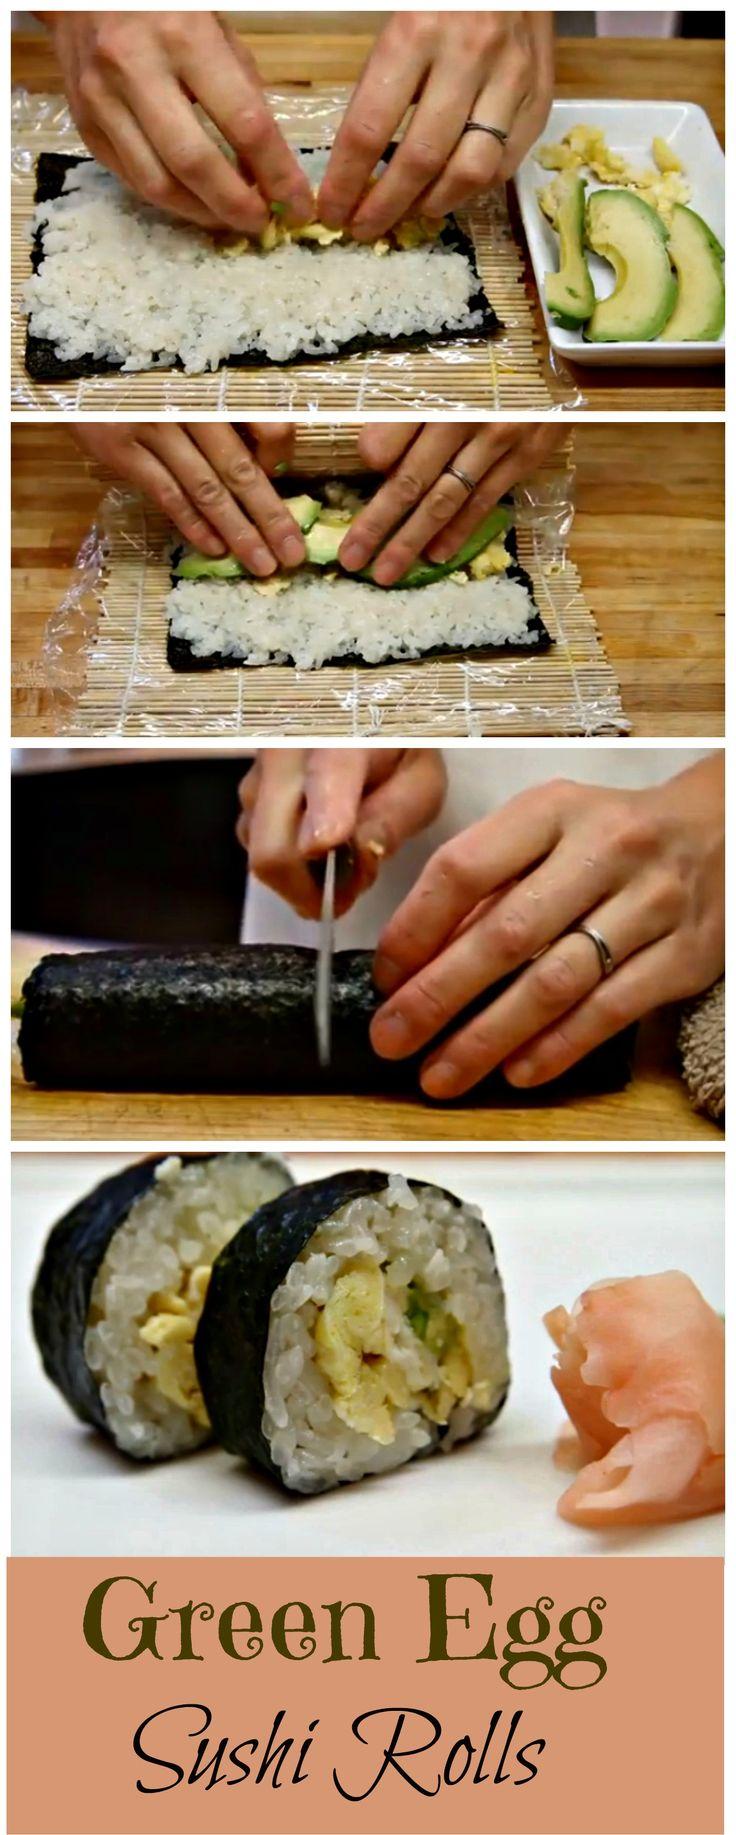 Green Egg Sushi Rolls http://www.ifood.tv/recipe/how-to-make-sushi-green-egg-sushi-rolls